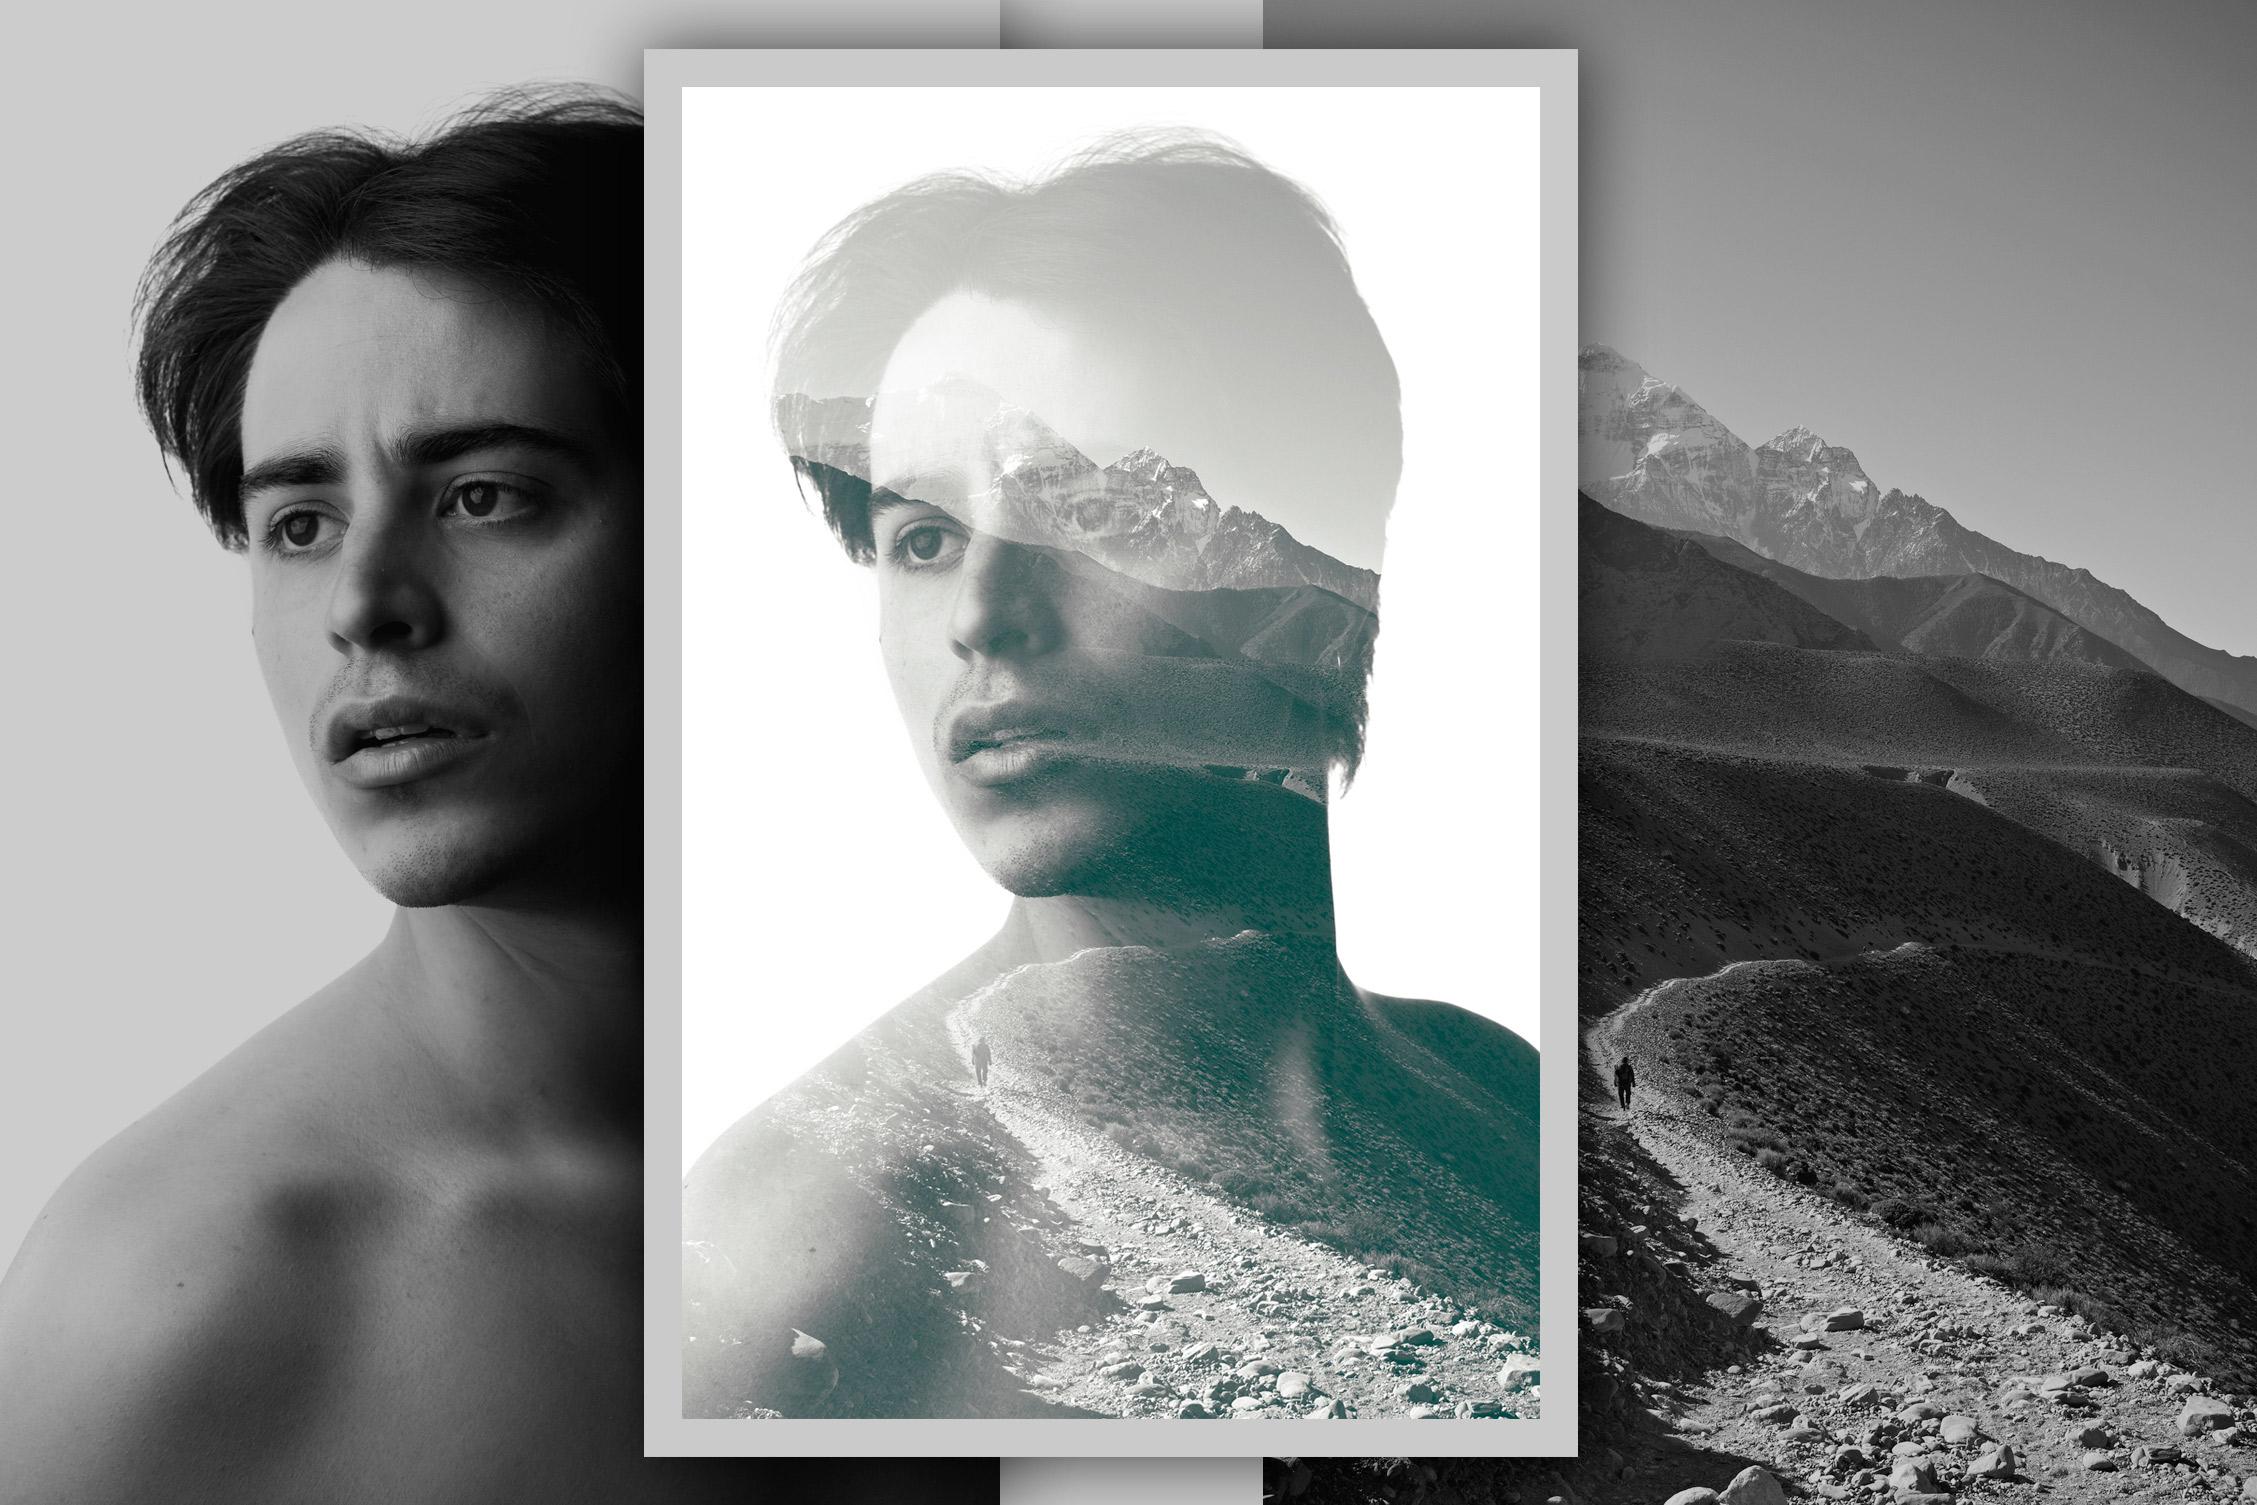 Corregir fotografias desenfocadas con photoshop 56